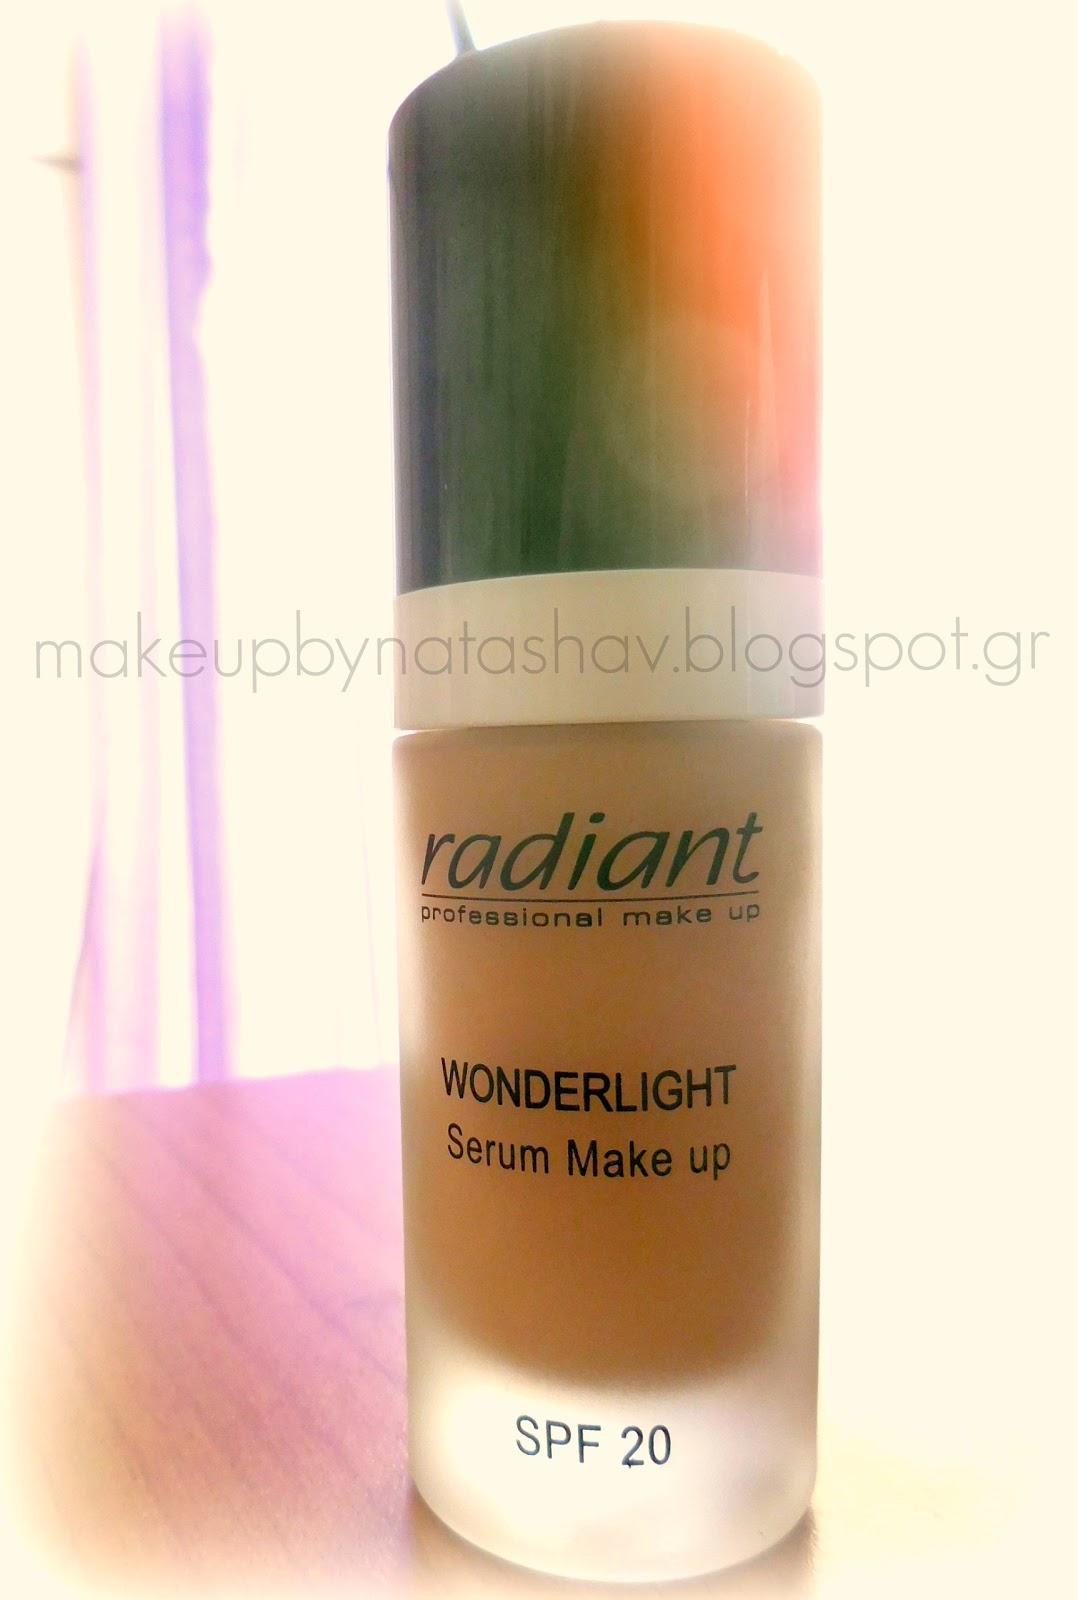 Radiant Professional Make Up: Wonderlight Serum Make Up